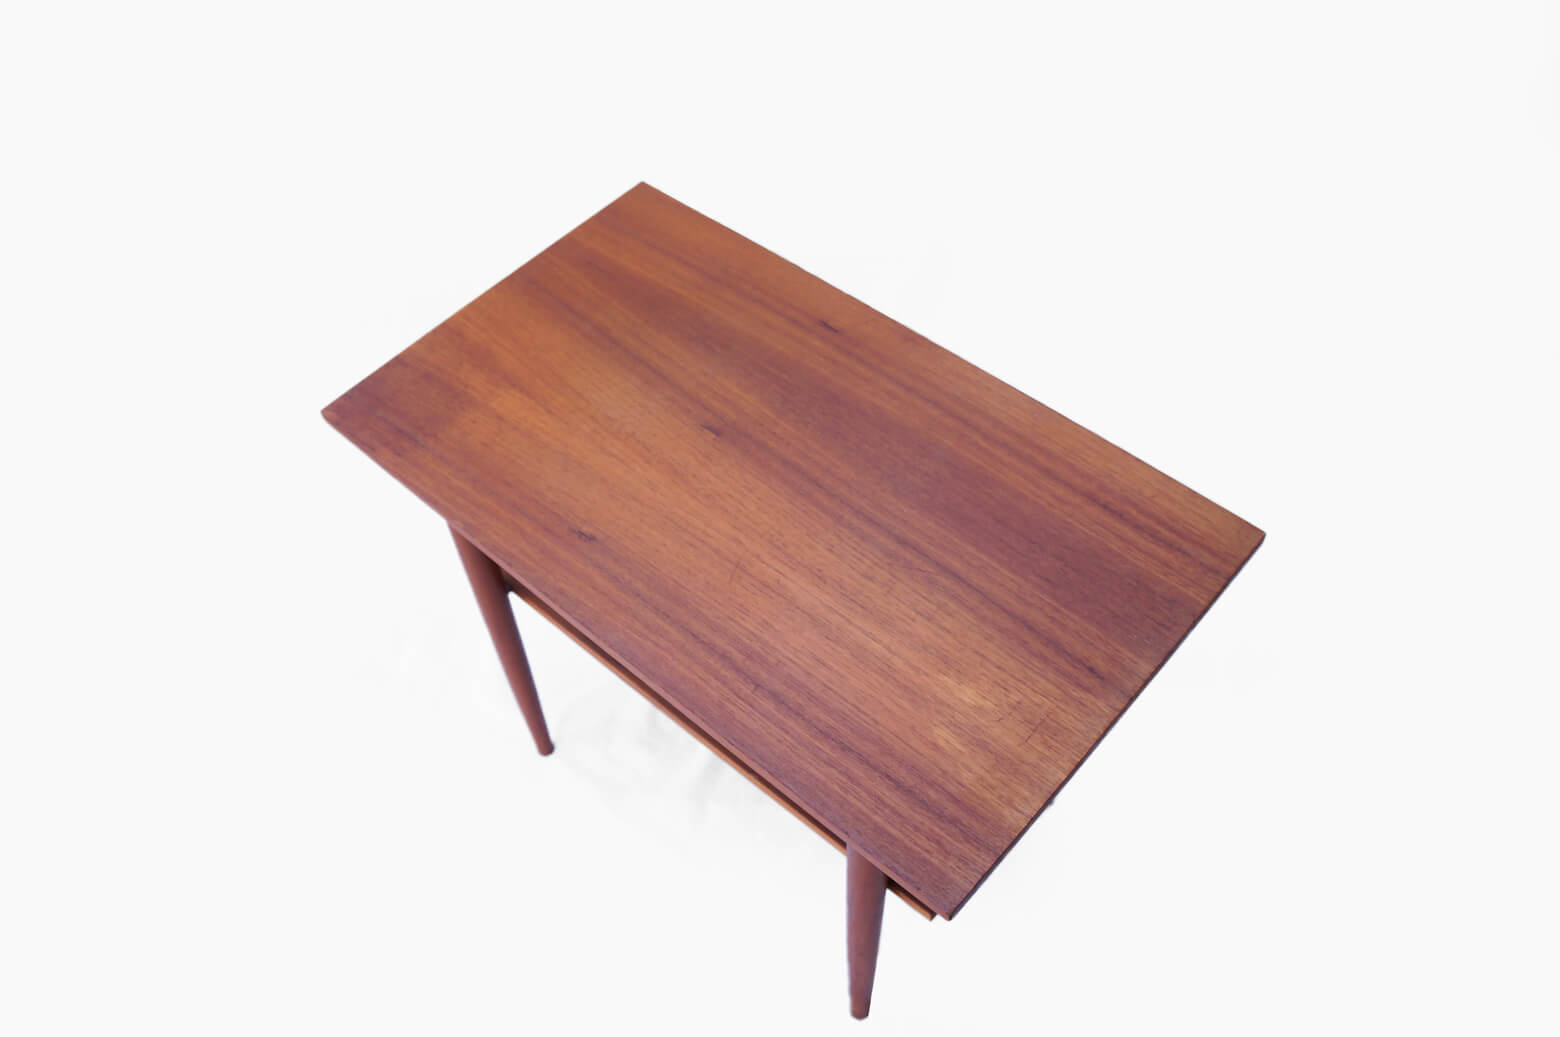 Danish Vintage Side Table/デンマーク ヴィンテージ サイドテーブル